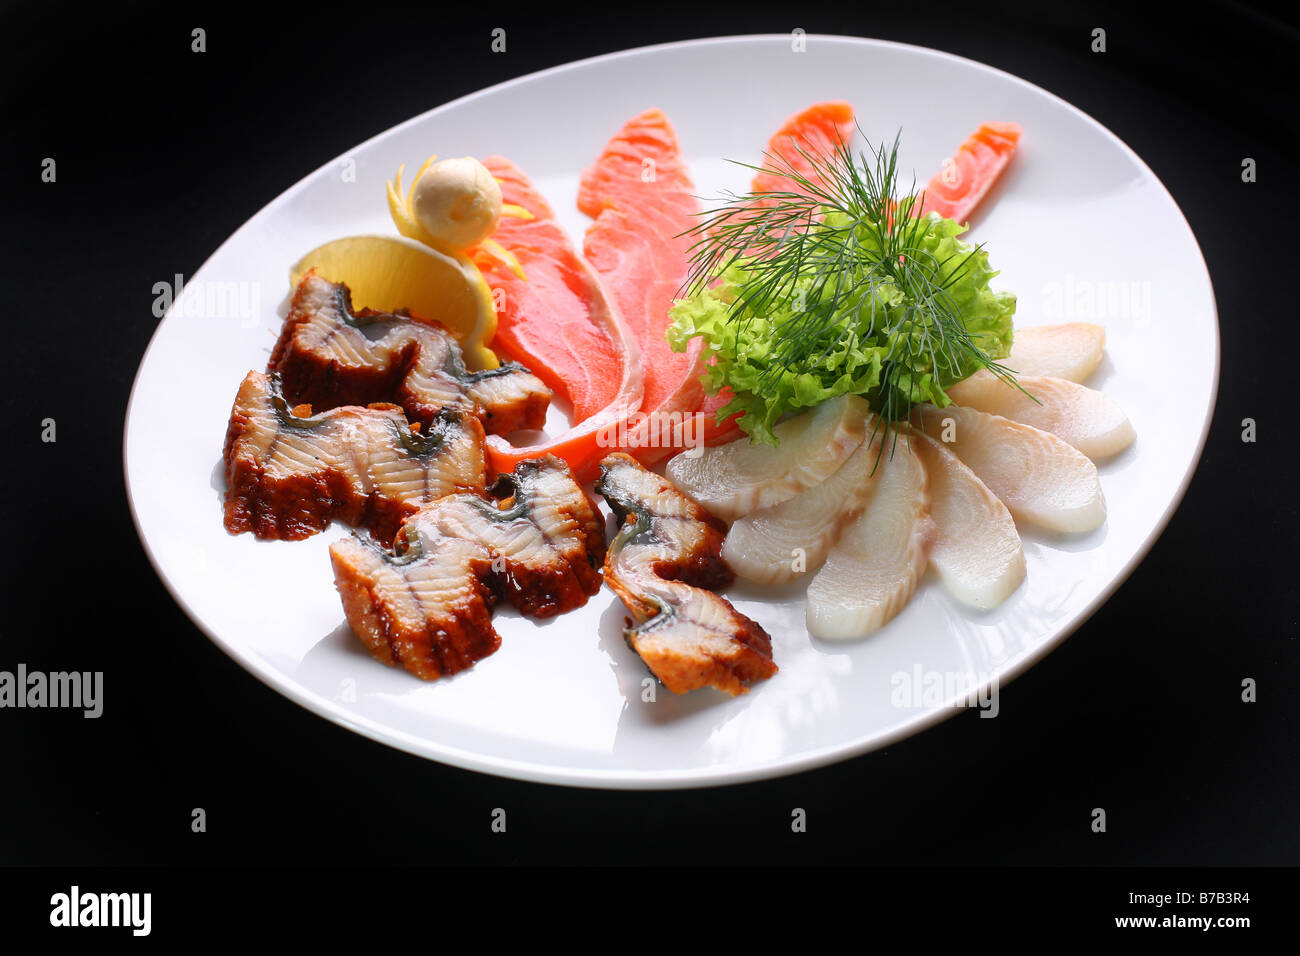 Sea fish - Stock Image